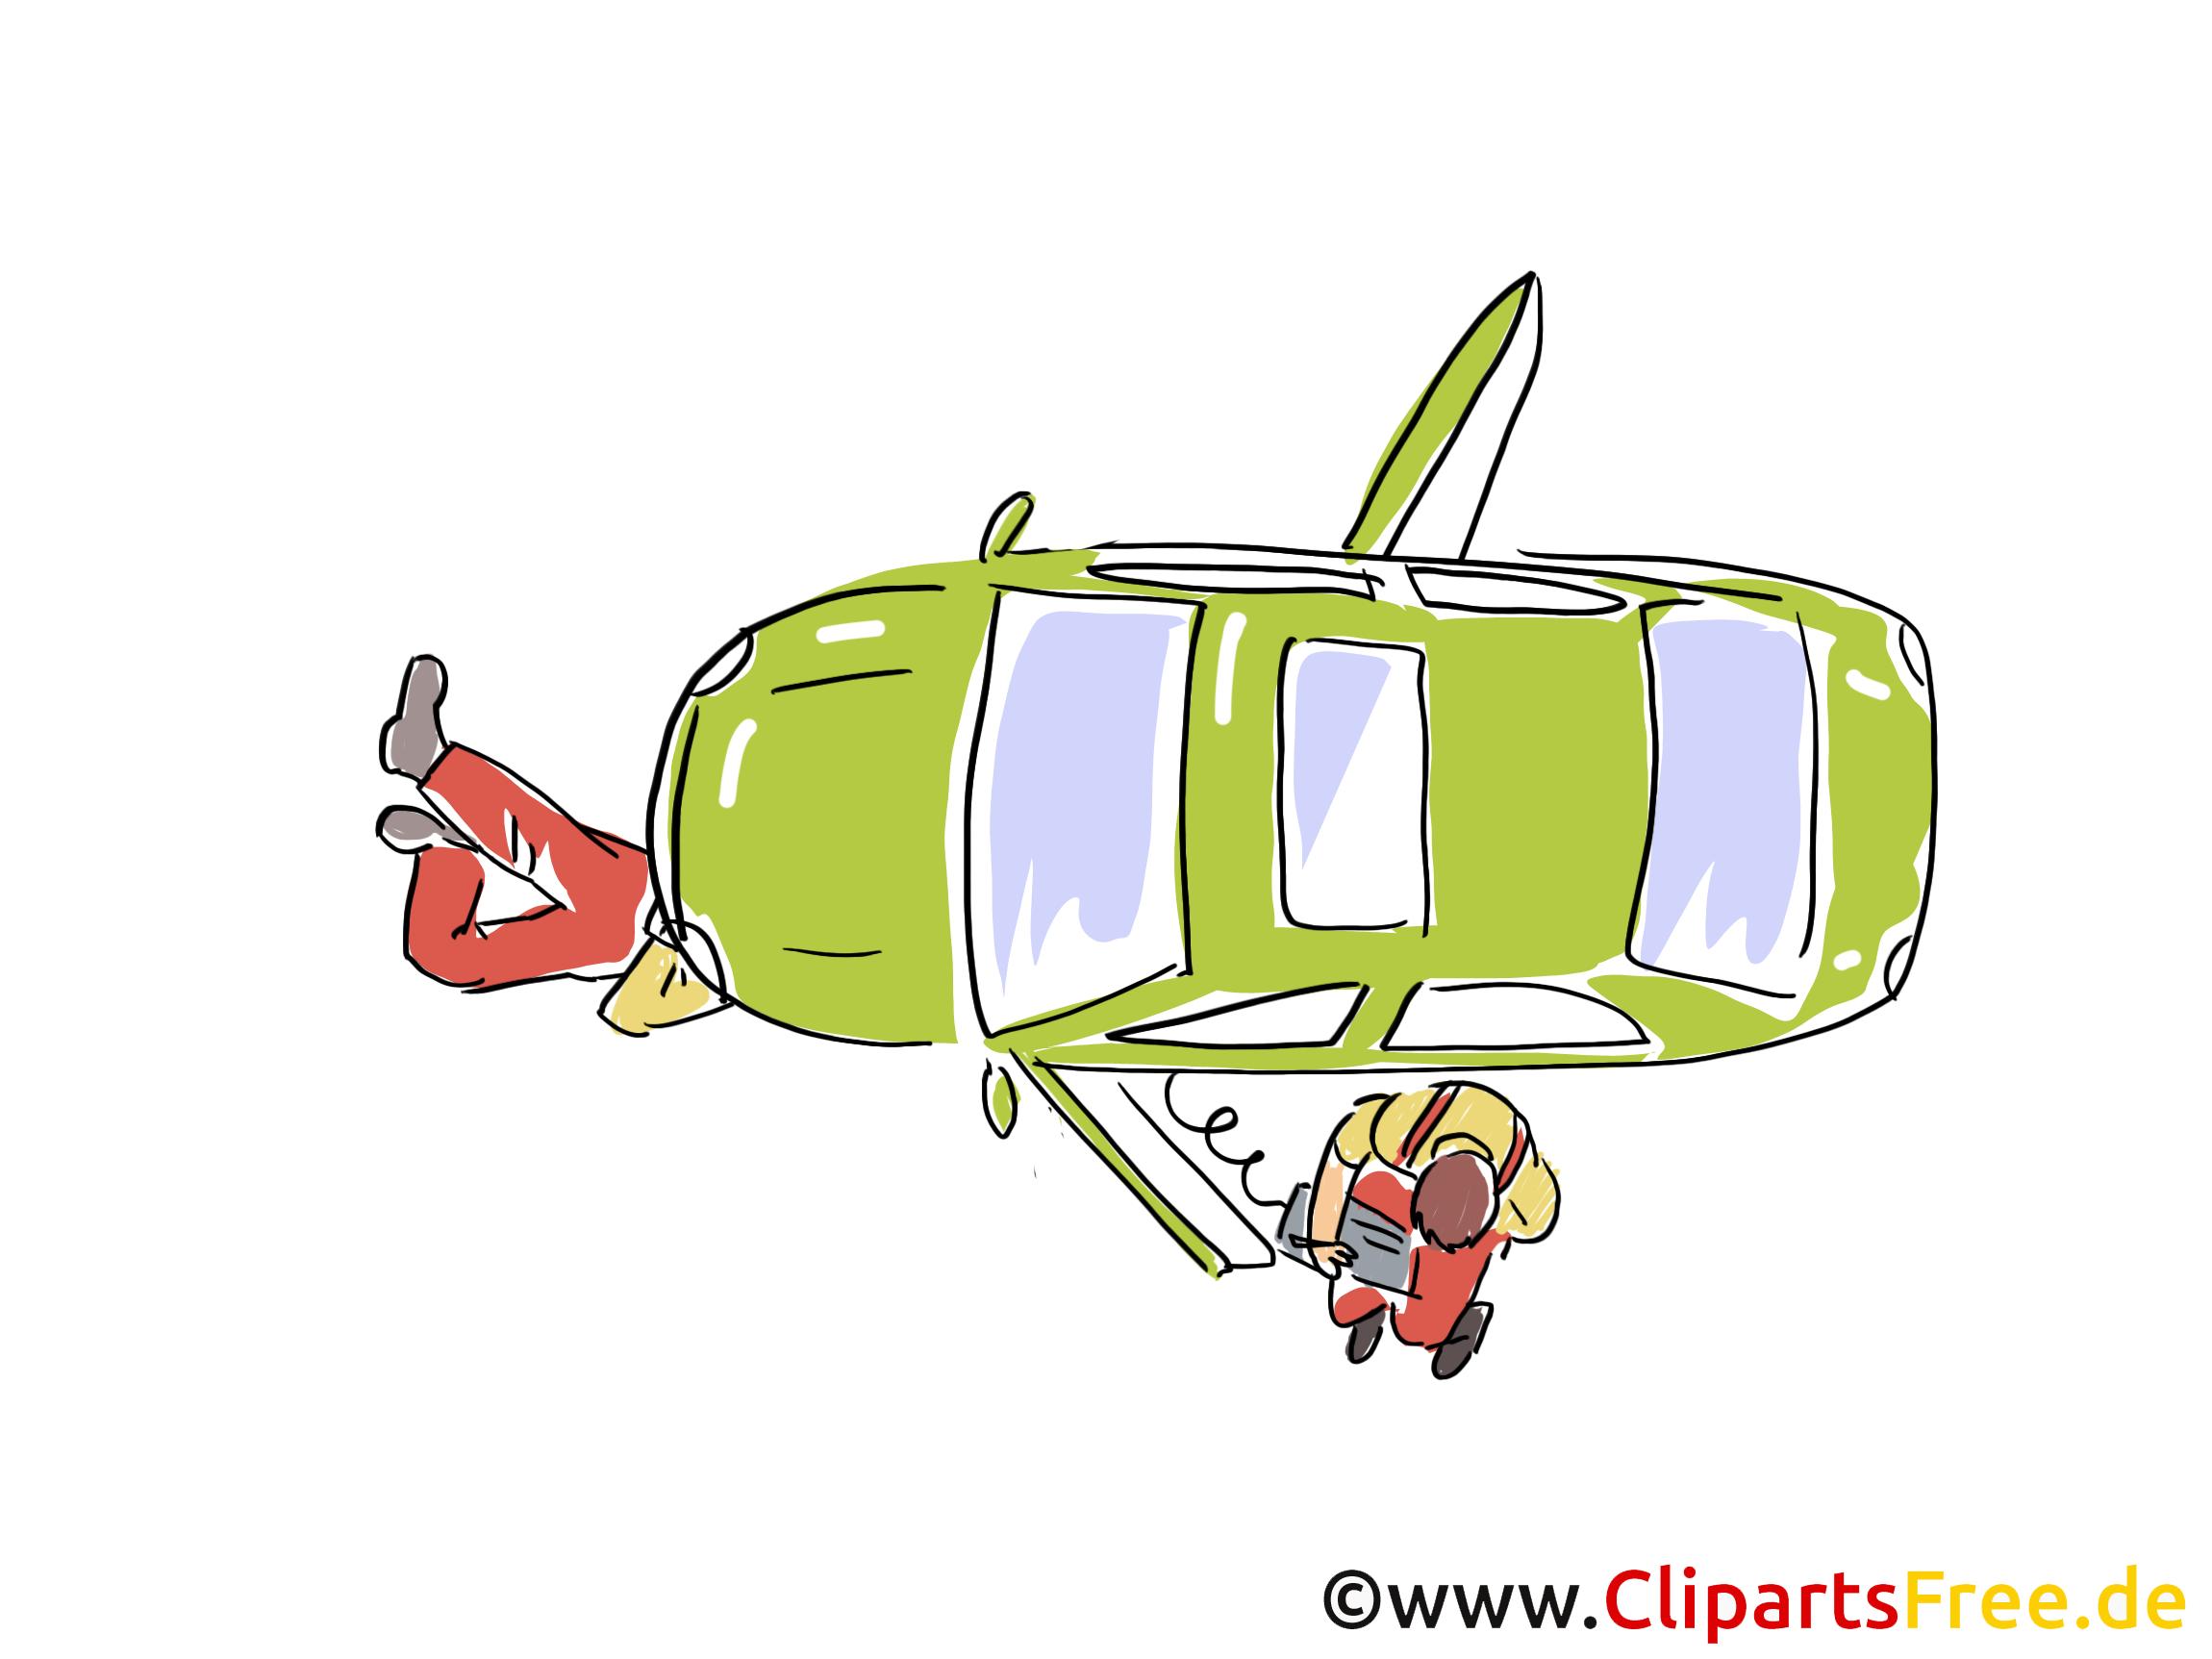 Auto Blick von Oben Clipart, Bild, Grafik, Cartoon, Illustration gratis